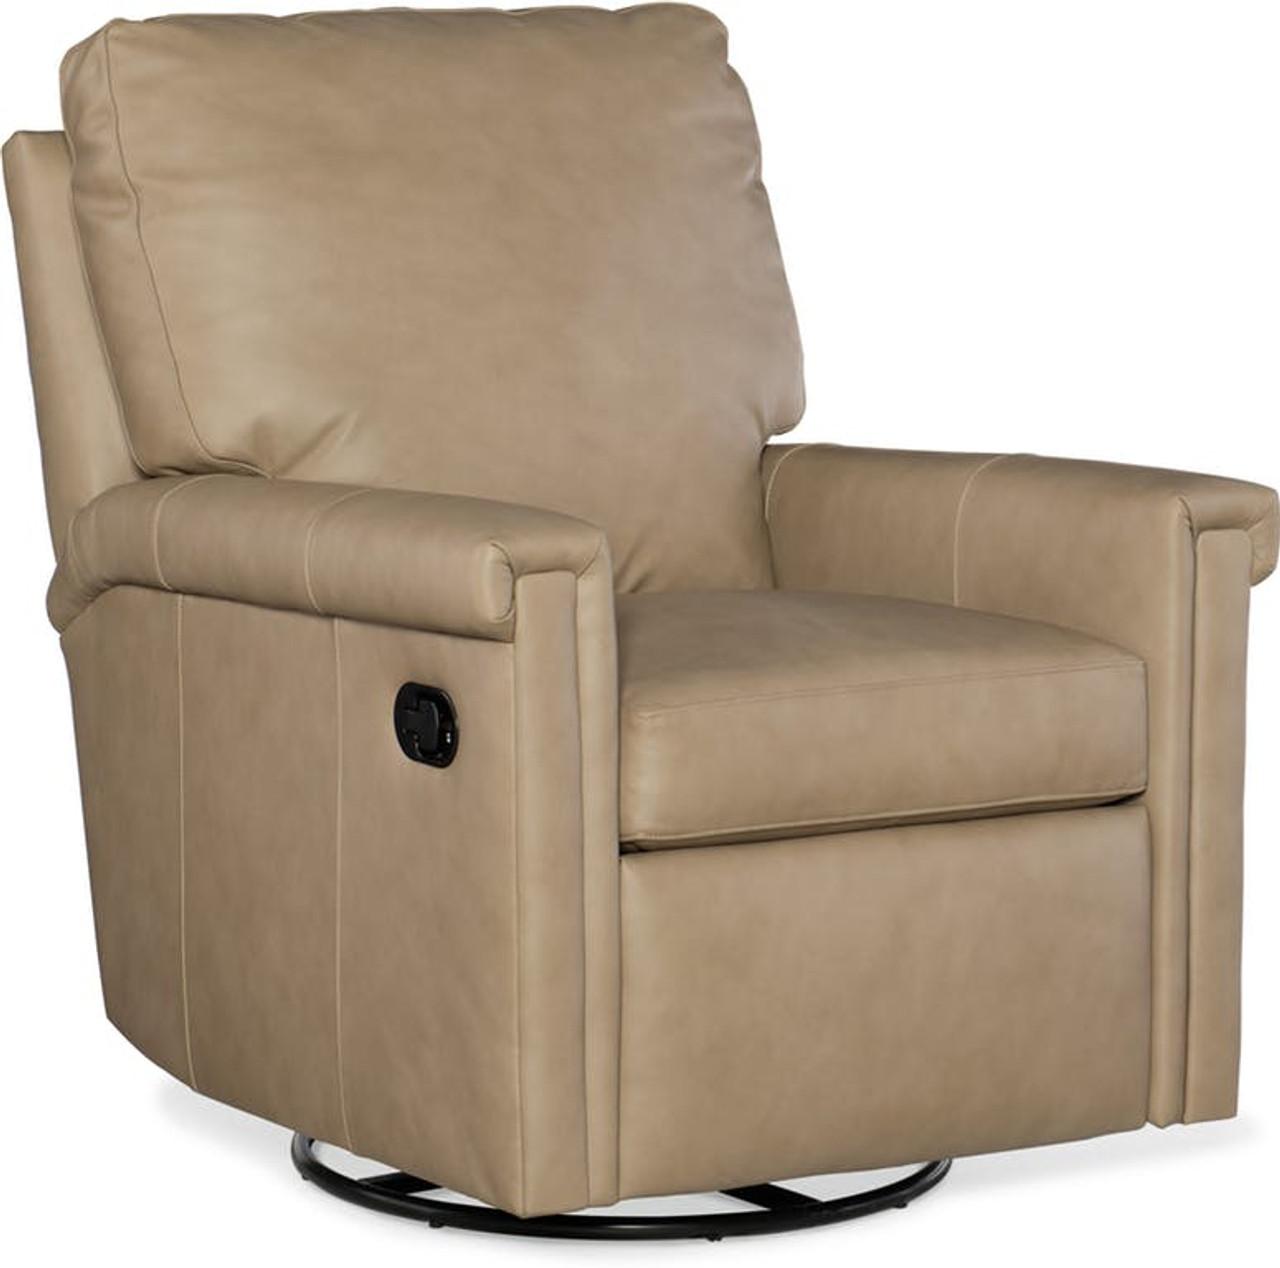 Fine Bradington Young Kara 7084 Wall Hugger Recliner Ibusinesslaw Wood Chair Design Ideas Ibusinesslaworg